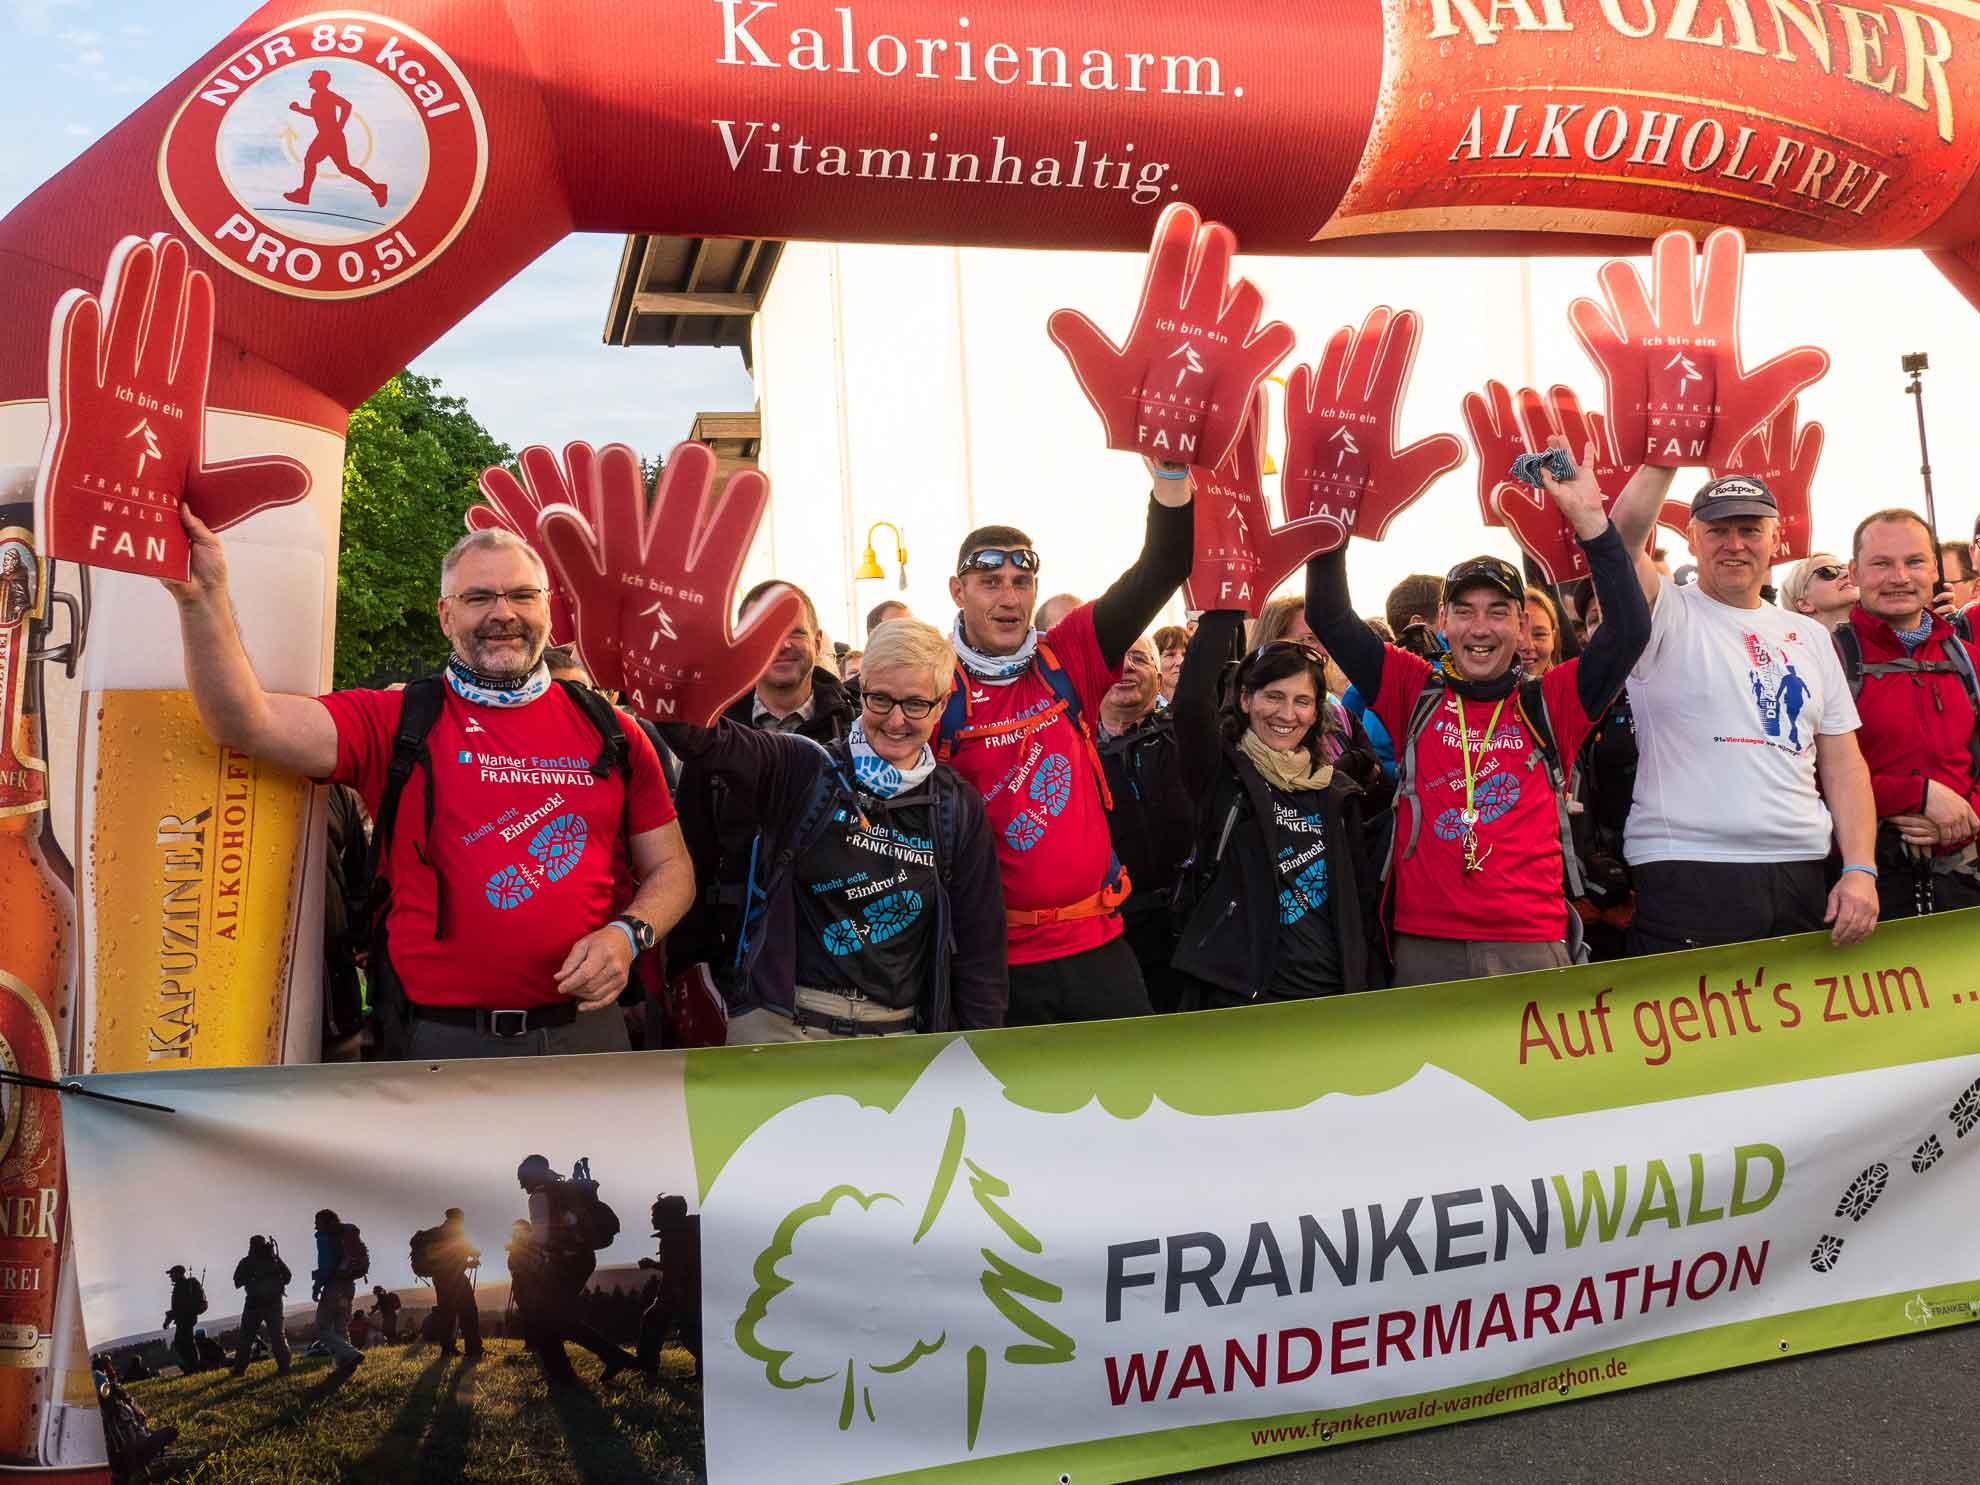 Frankenwald - Wandermarathon